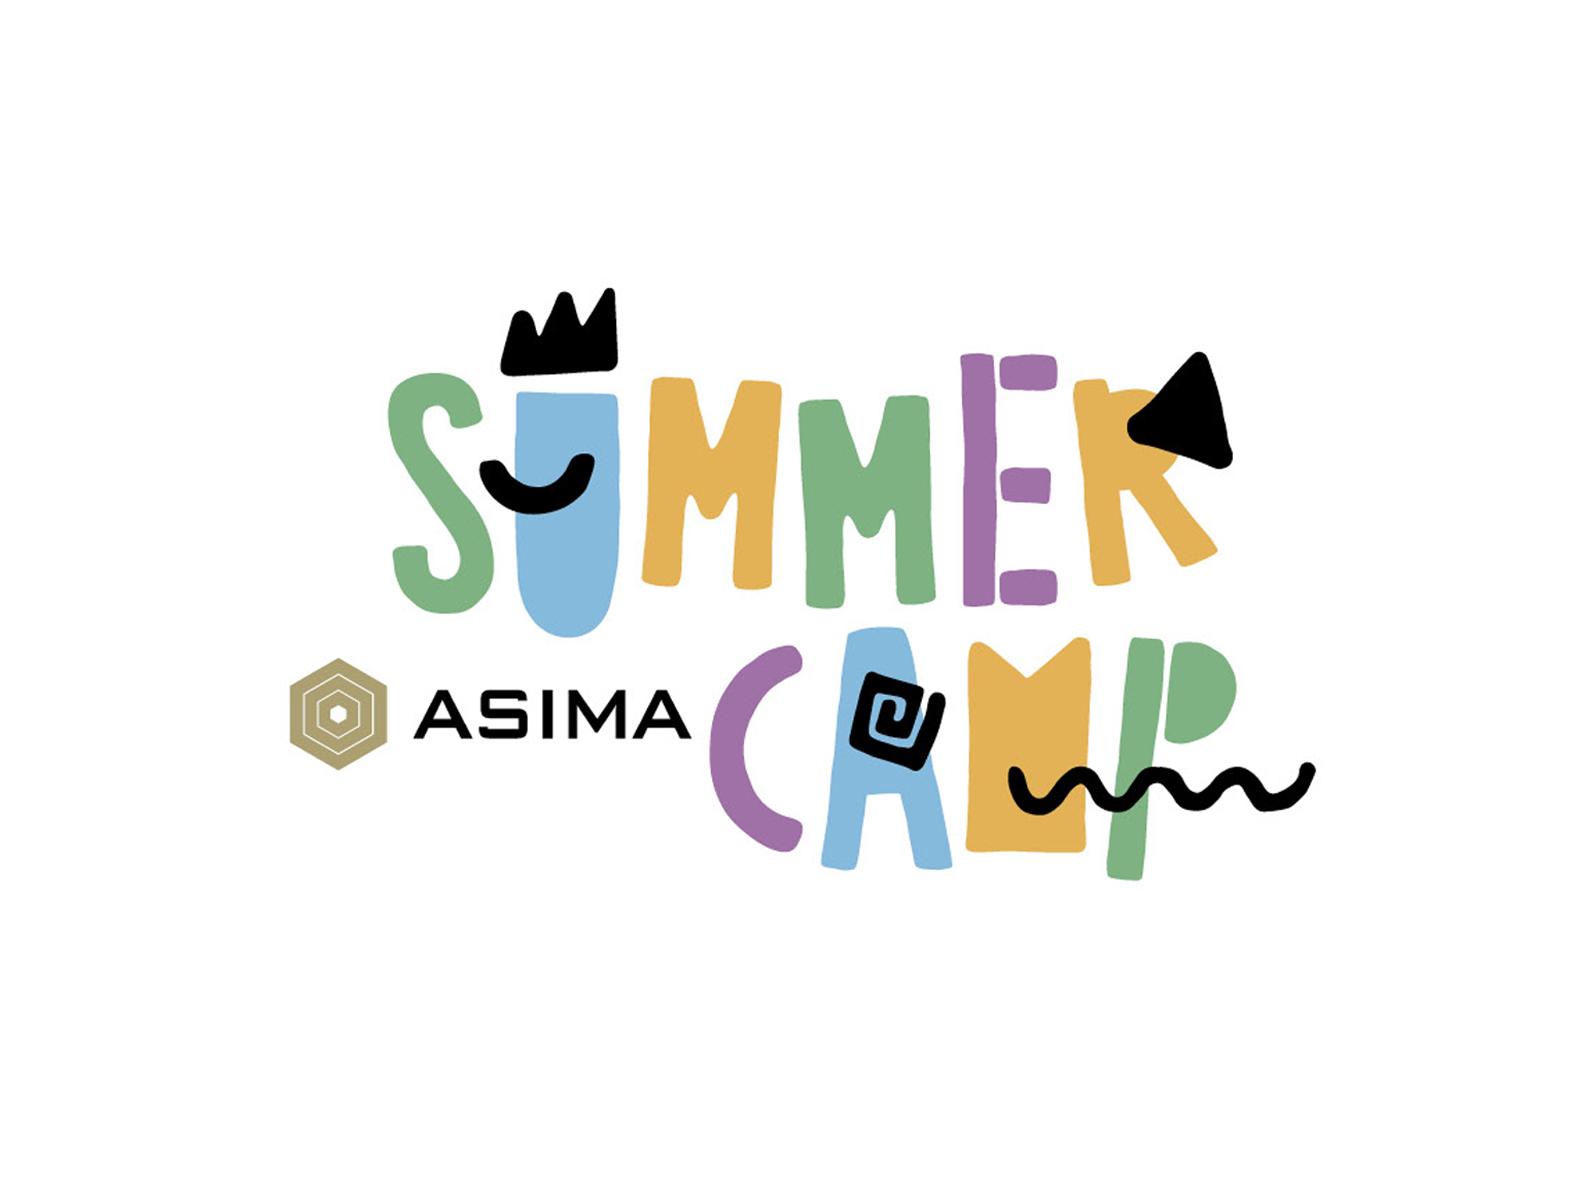 Asima Summer Camp Design